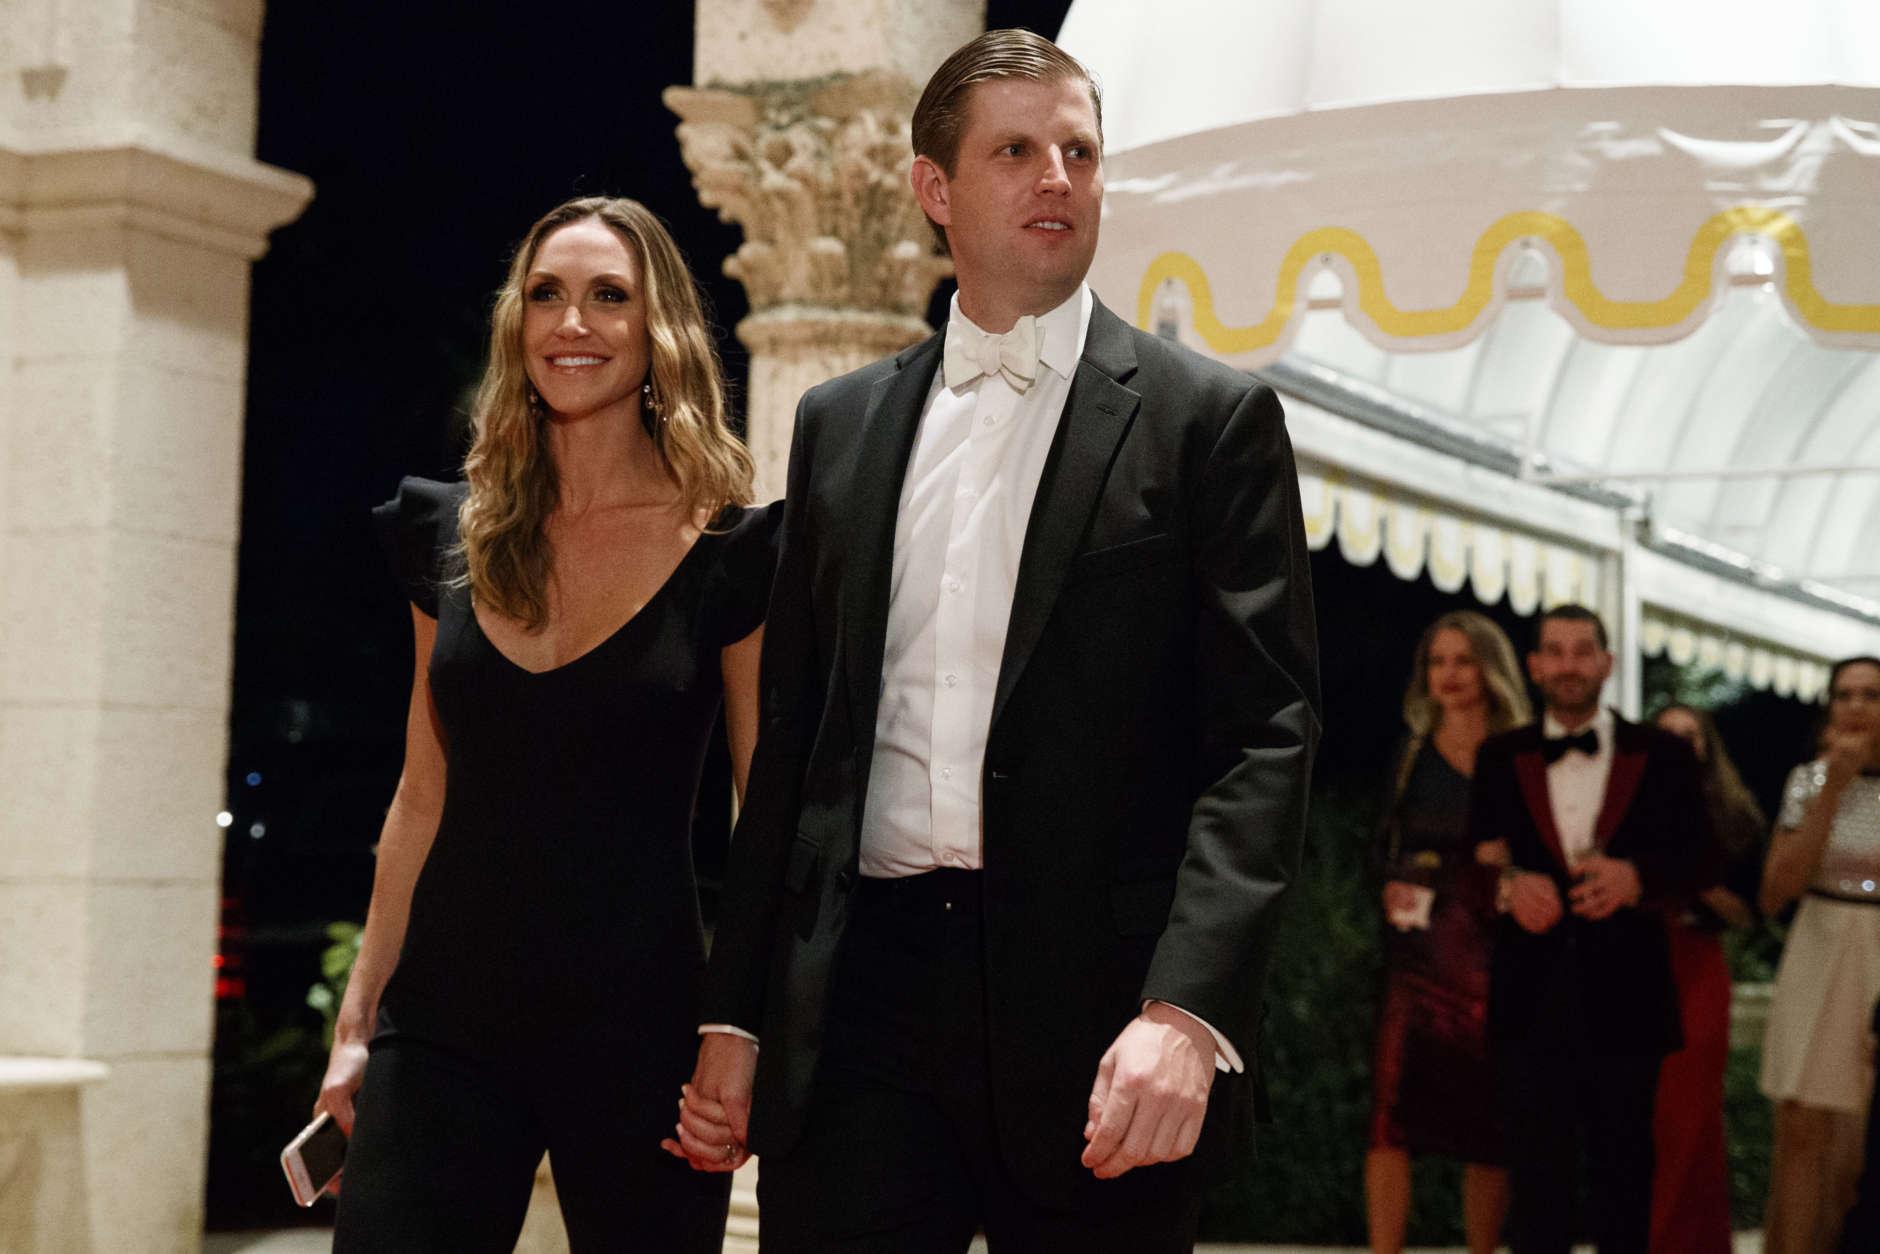 Eric Trump and his wife Lara Trump arrive for a New Year's Eve gala at Mar-a-Lago resort, Sunday, Dec. 31, 2017, in Palm Beach, Fla. (AP Photo/Evan Vucci)